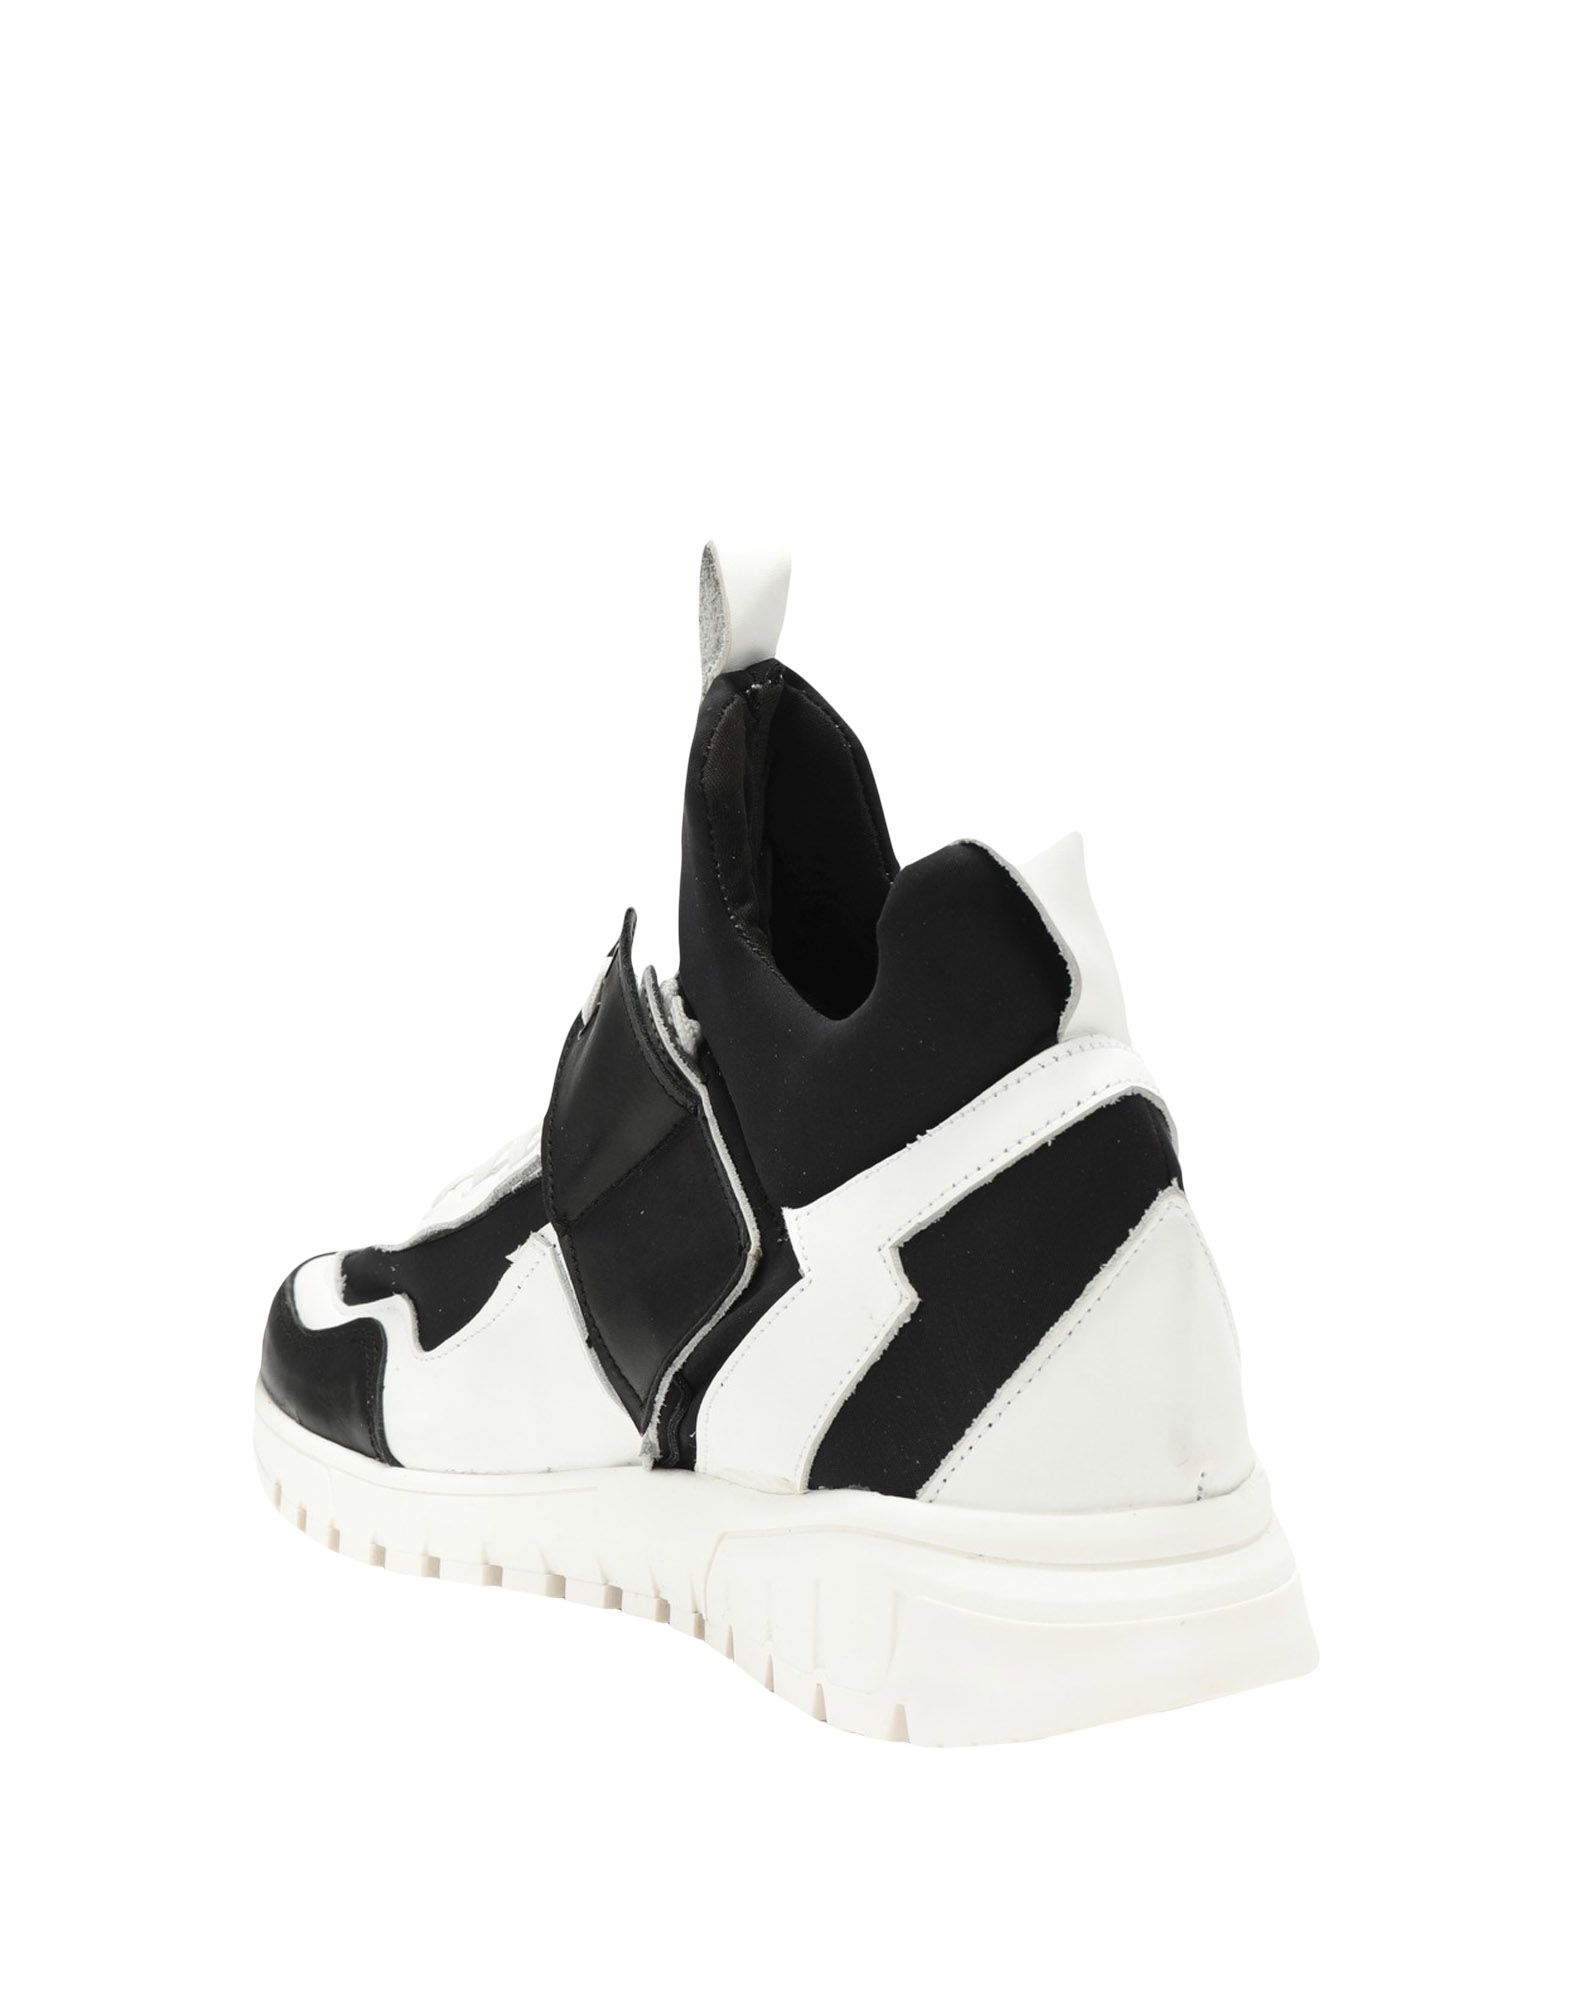 Savio Barbato Gute Sneakers Herren  11540054QL Gute Barbato Qualität beliebte Schuhe 901e05